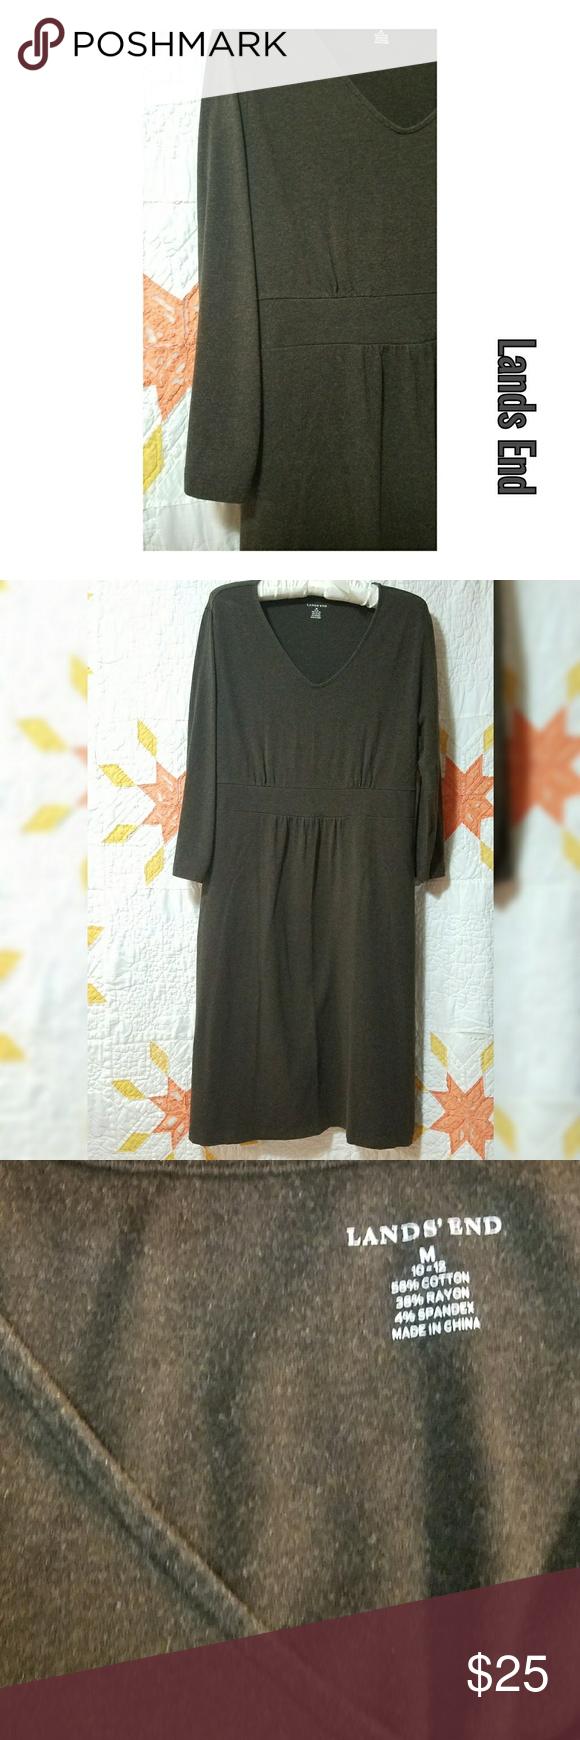 Landus end threequarter sleeve dark brown dress my posh picks